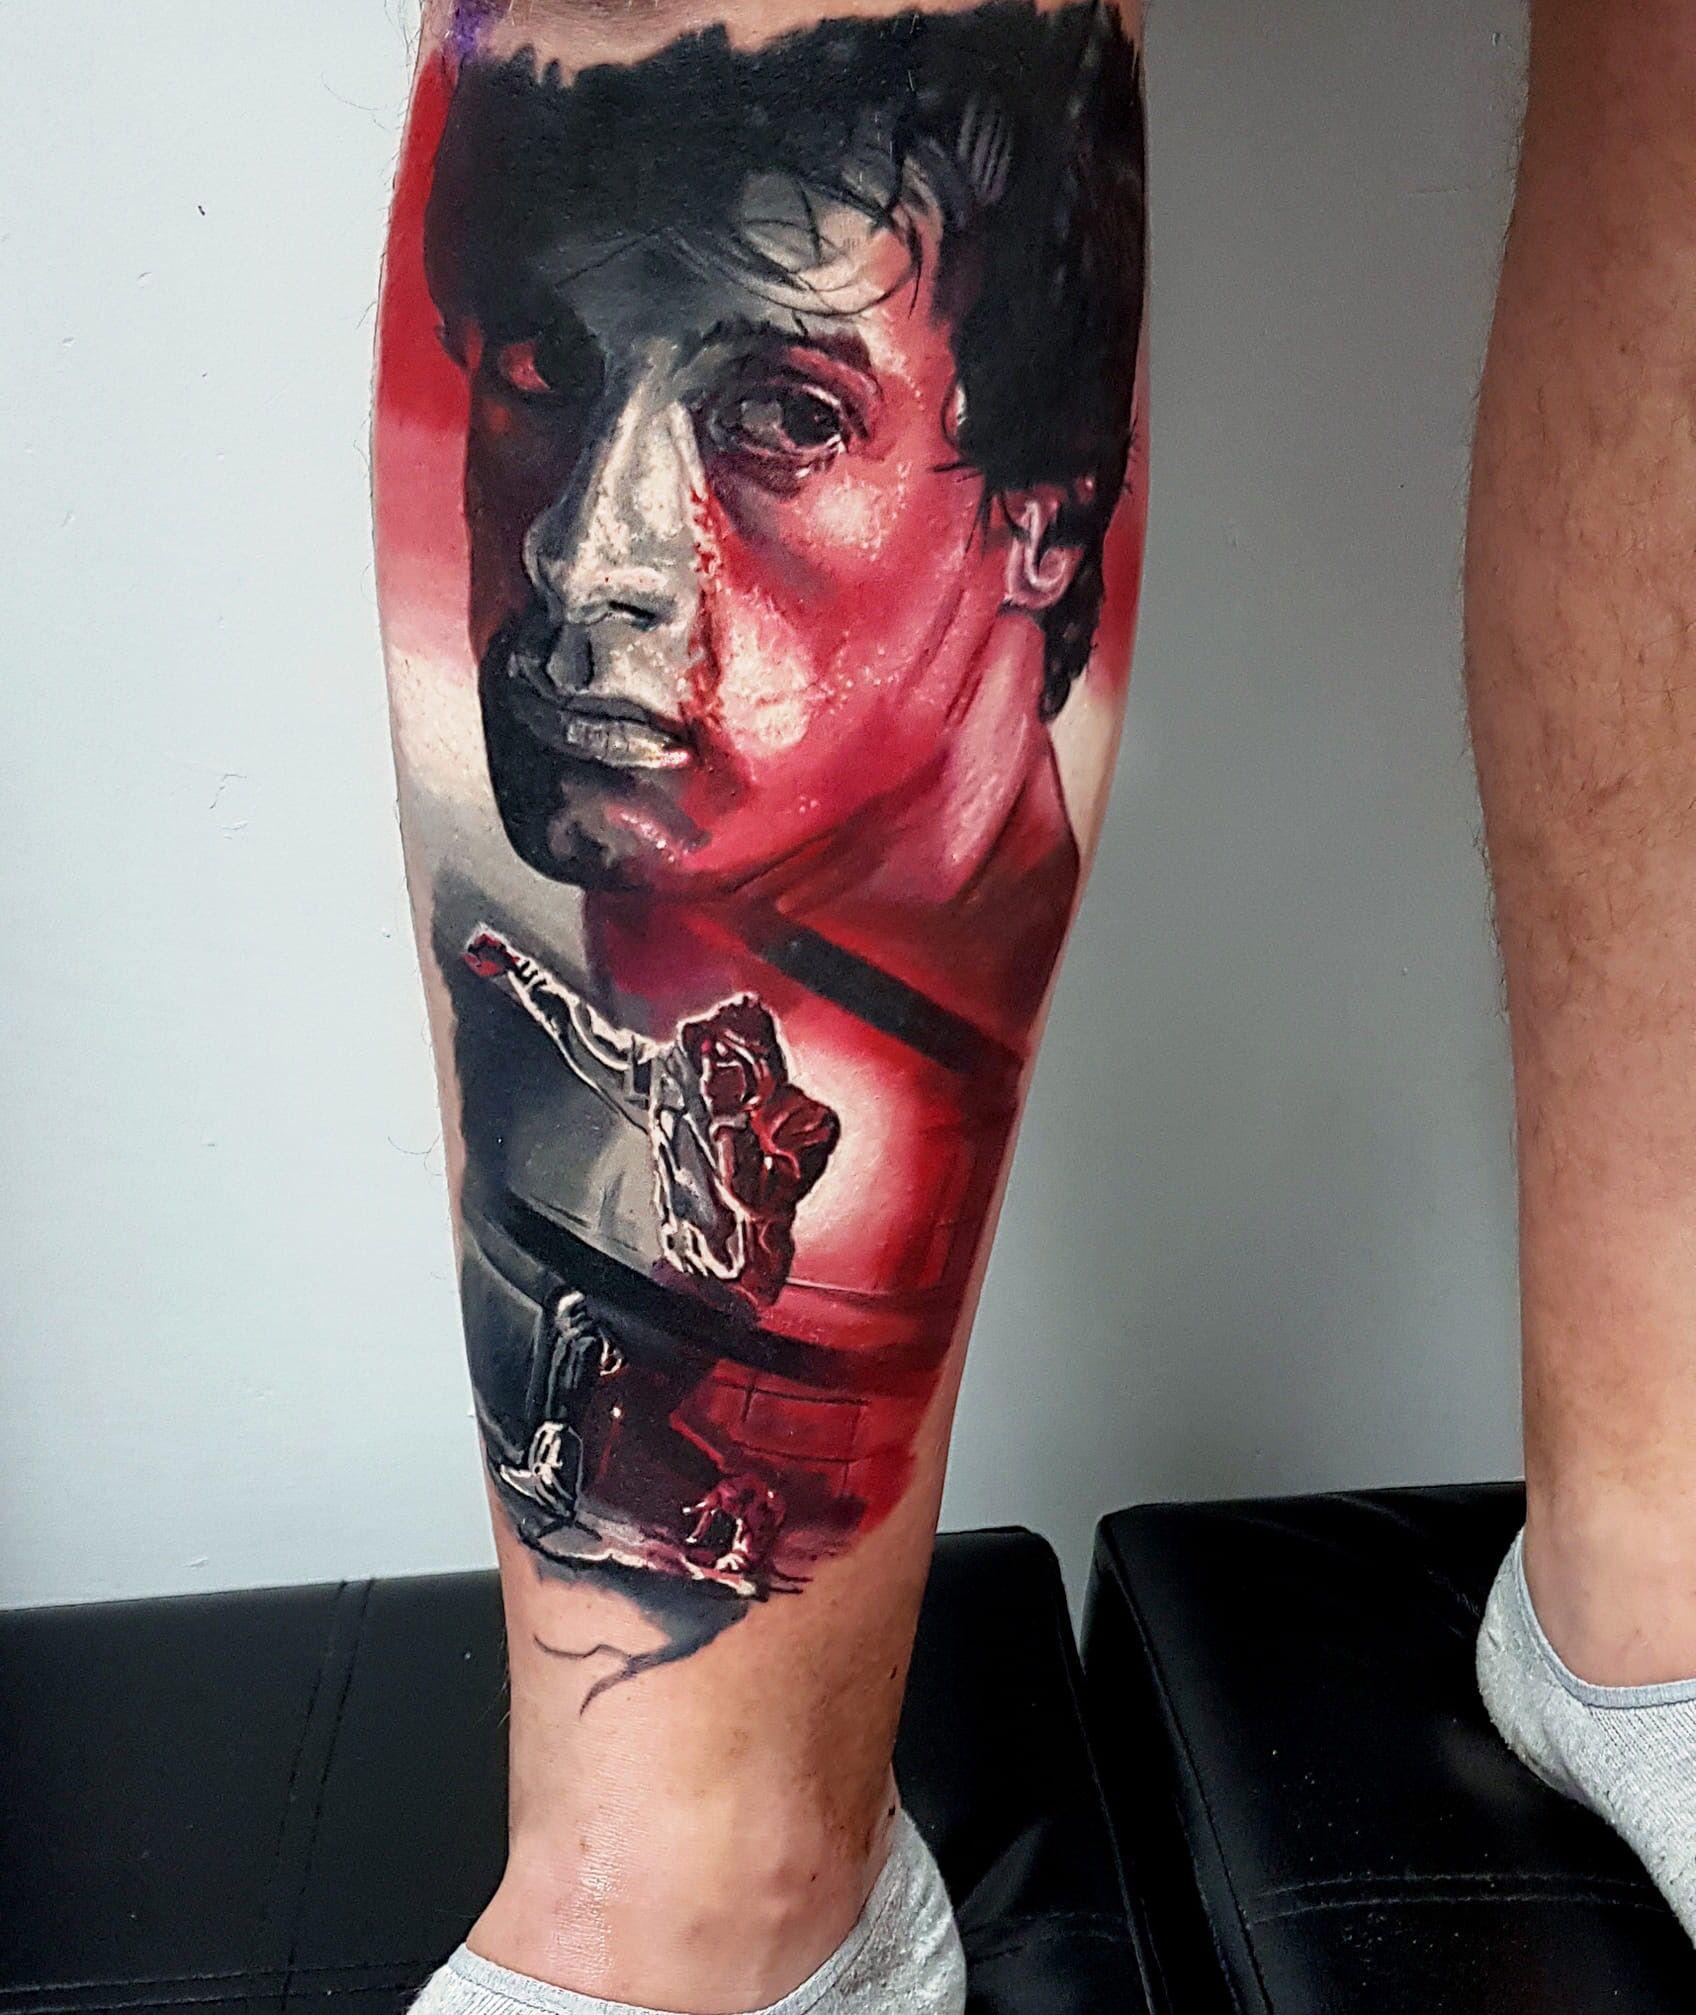 Pin By Plan B On Rocky Balboa My Idol Tattoos For Guys Cool Tattoos For Guys Tattoos